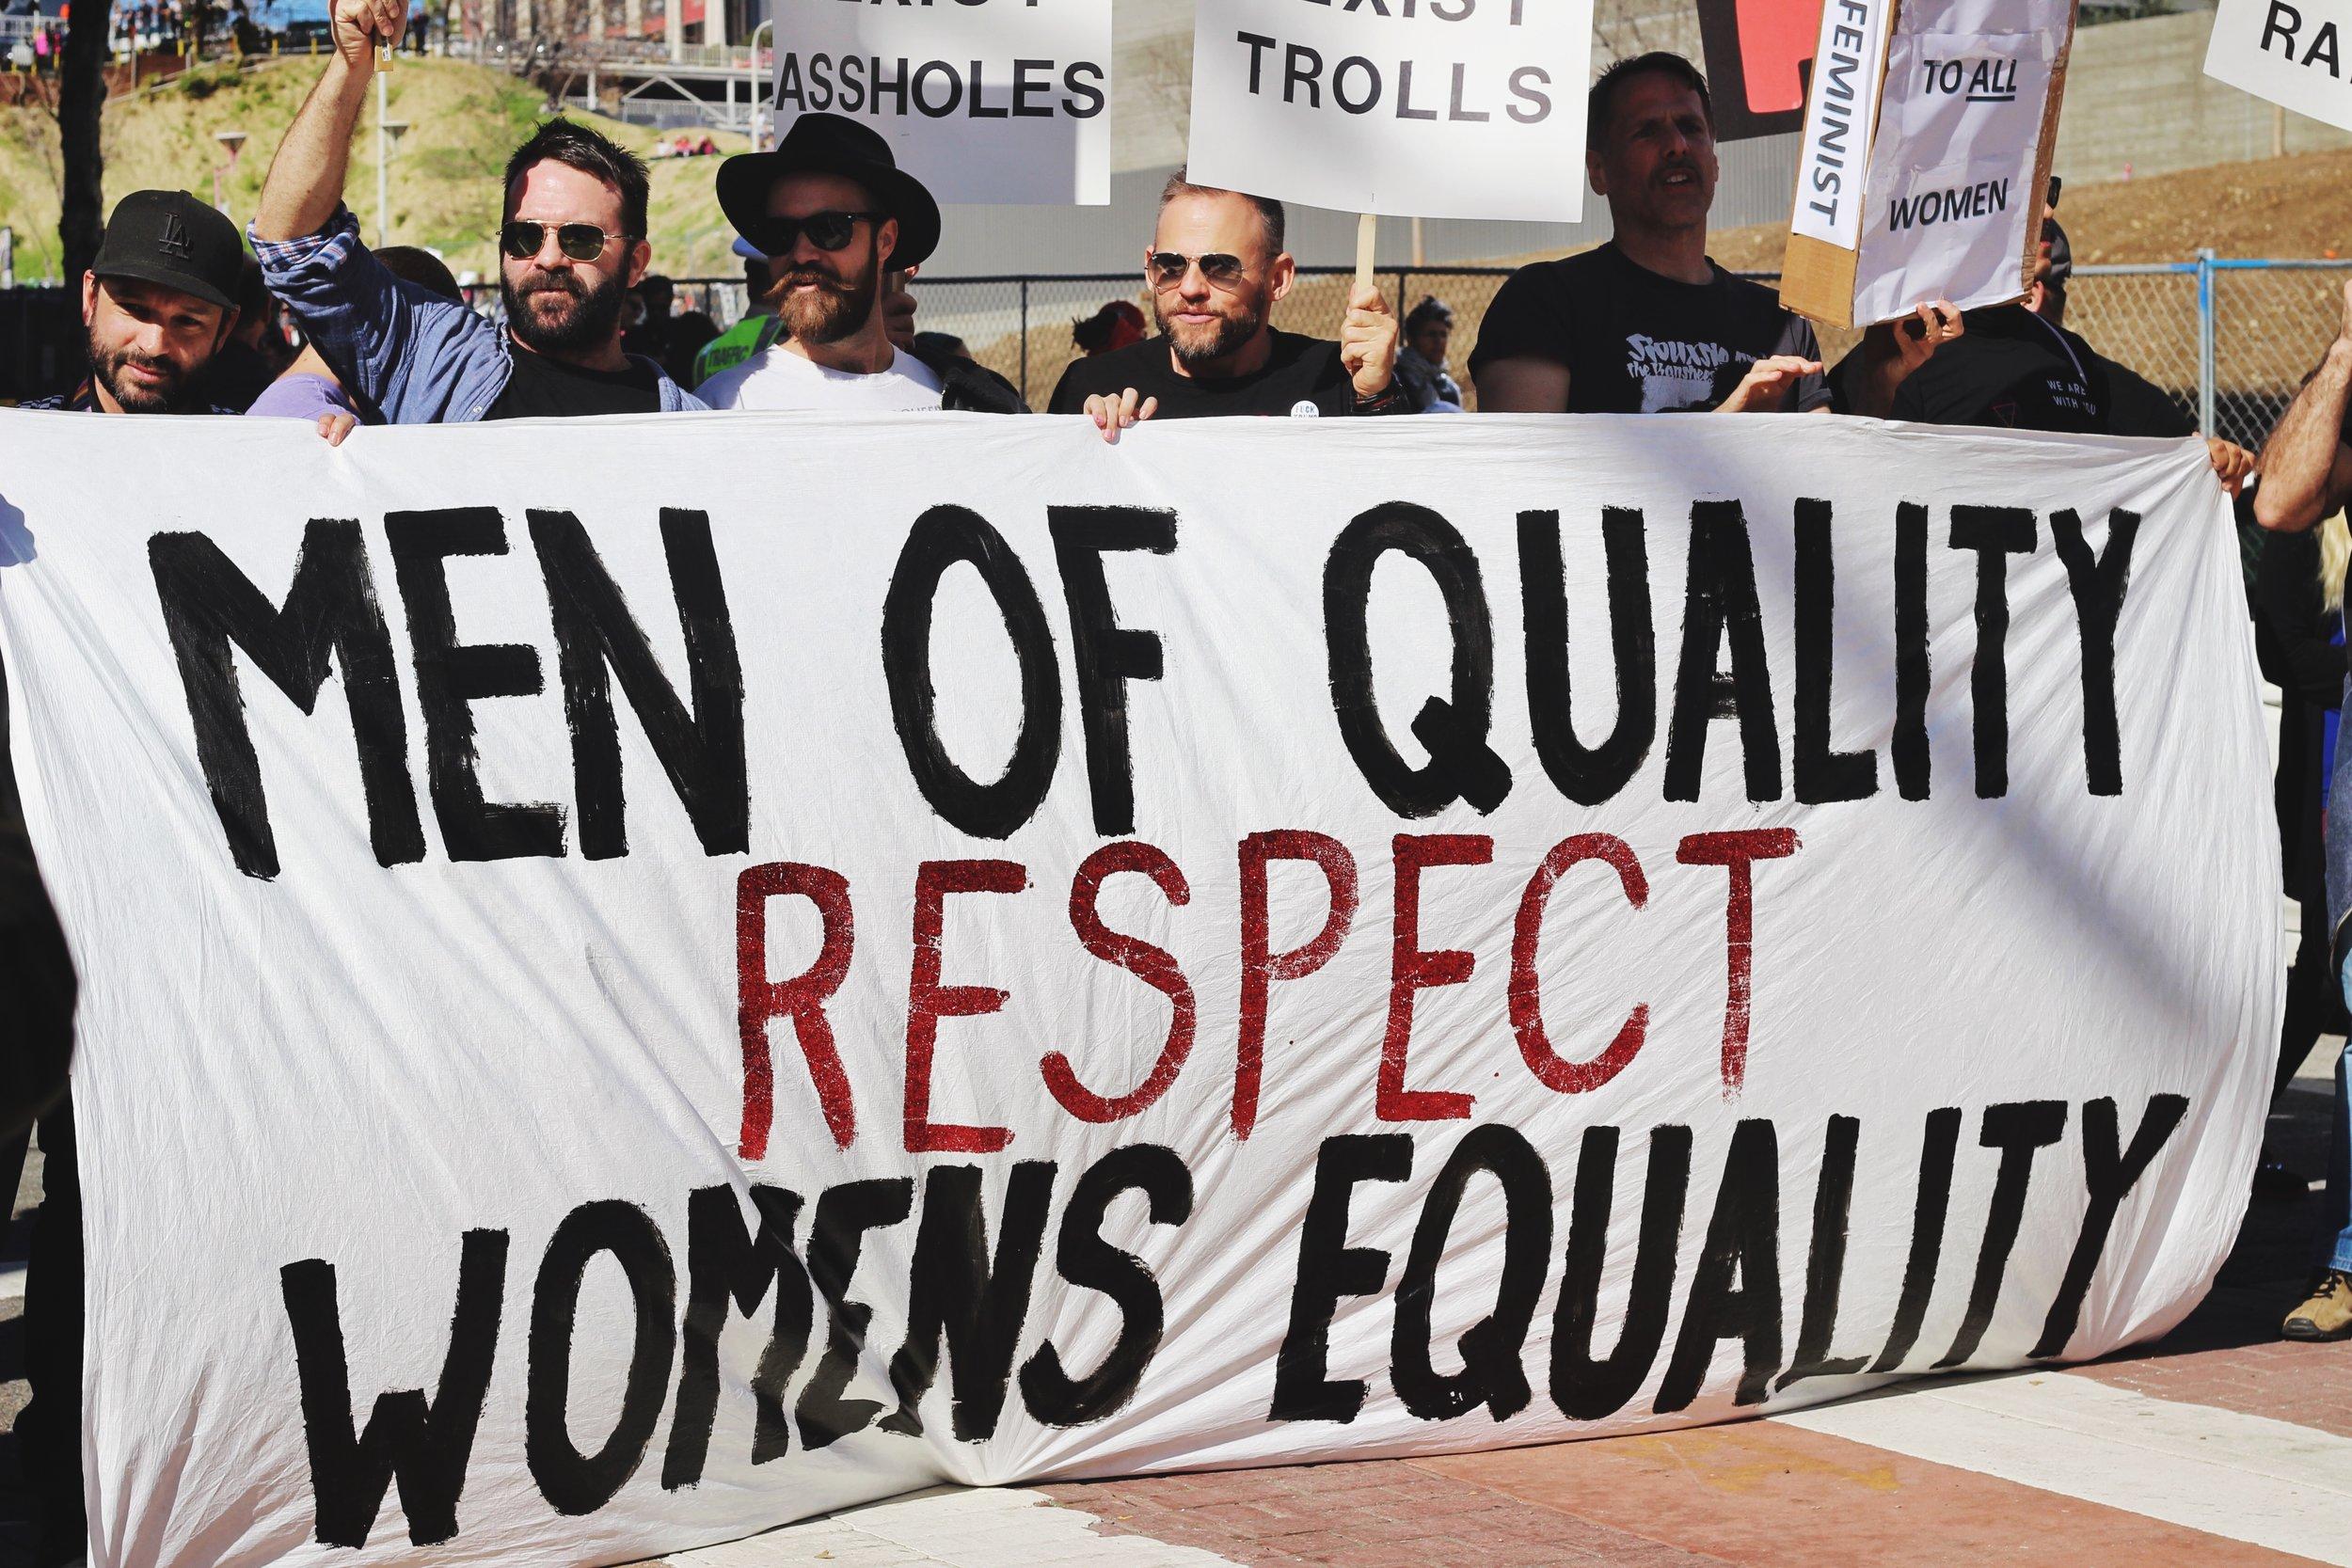 """privileged feminists should not repress men"" -"